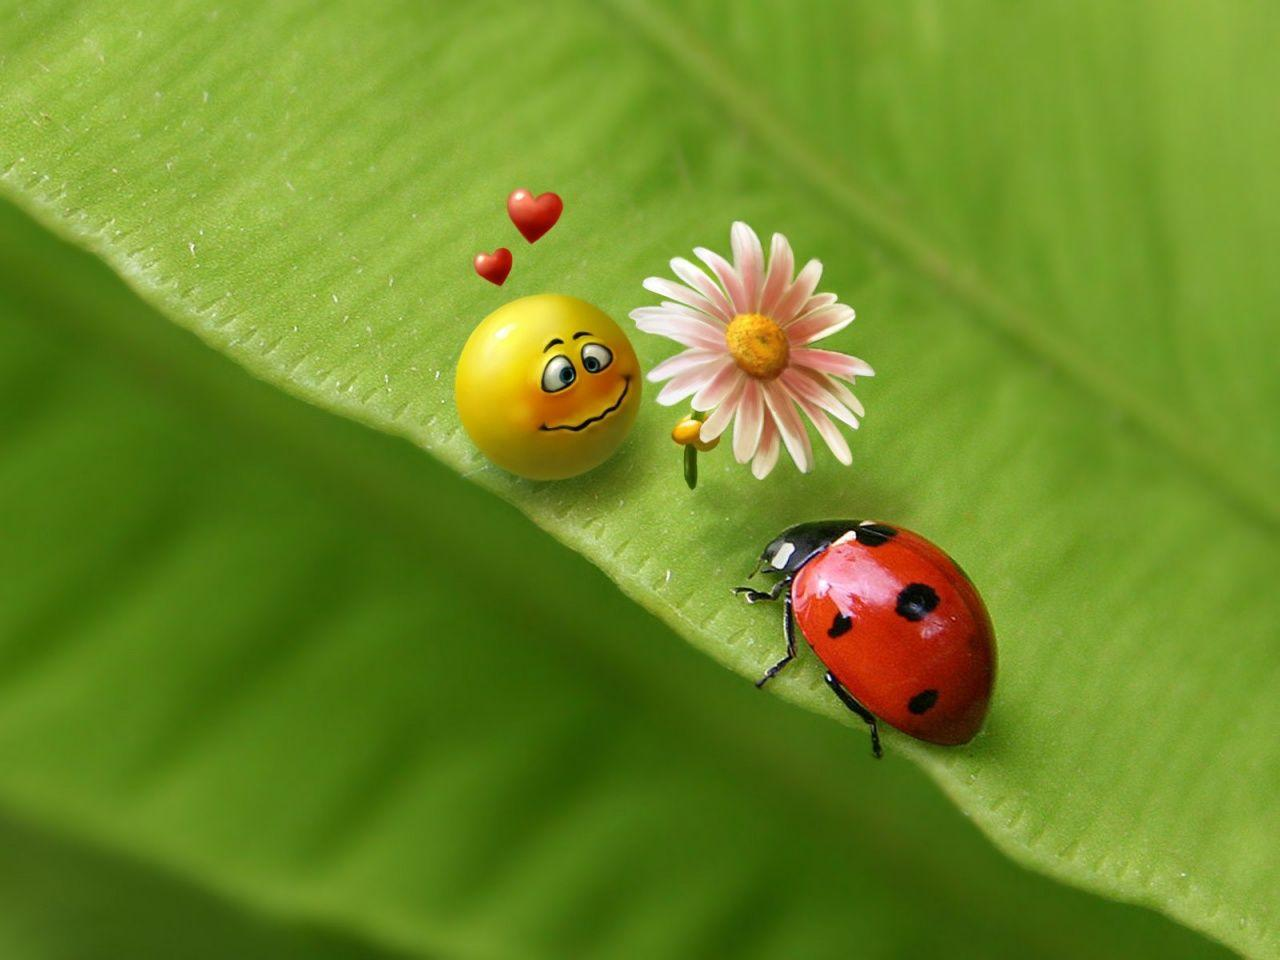 <b>Ladybug</b> Humor <b>Wallpapers</b> | WallpapersIn4k.net